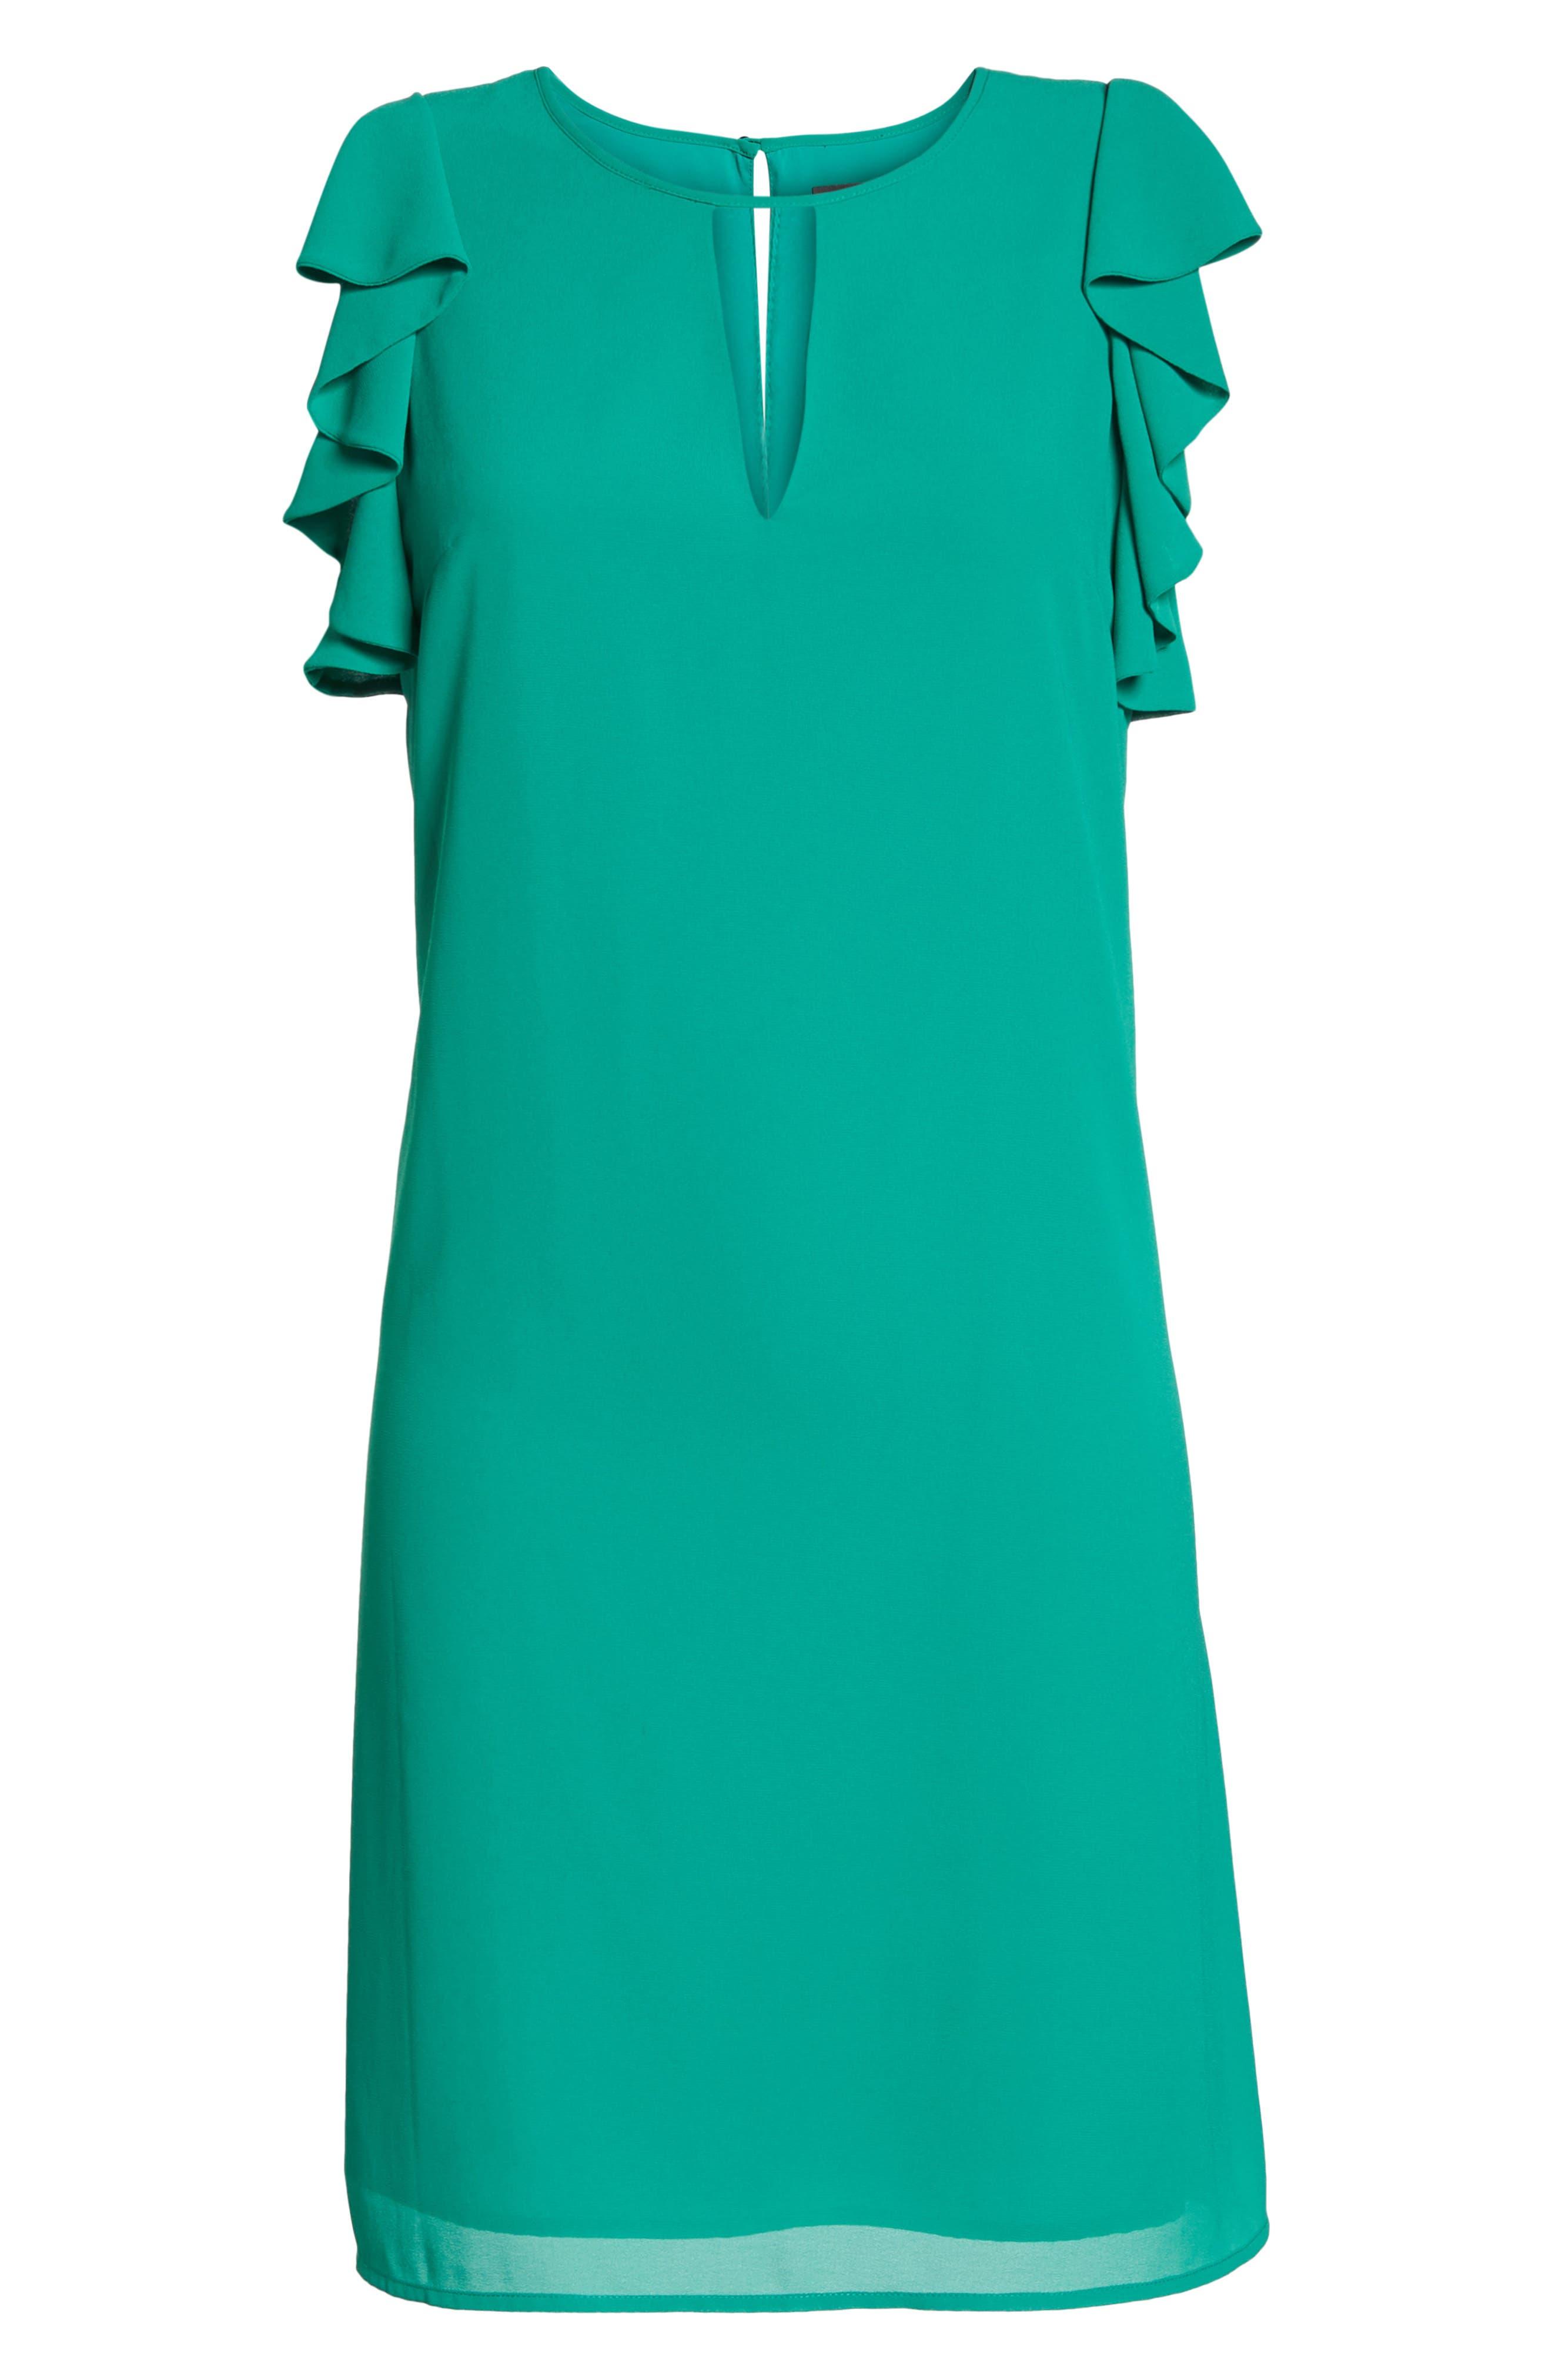 Soufflé Ruffle Chiffon Shift Dress,                             Alternate thumbnail 7, color,                             Green